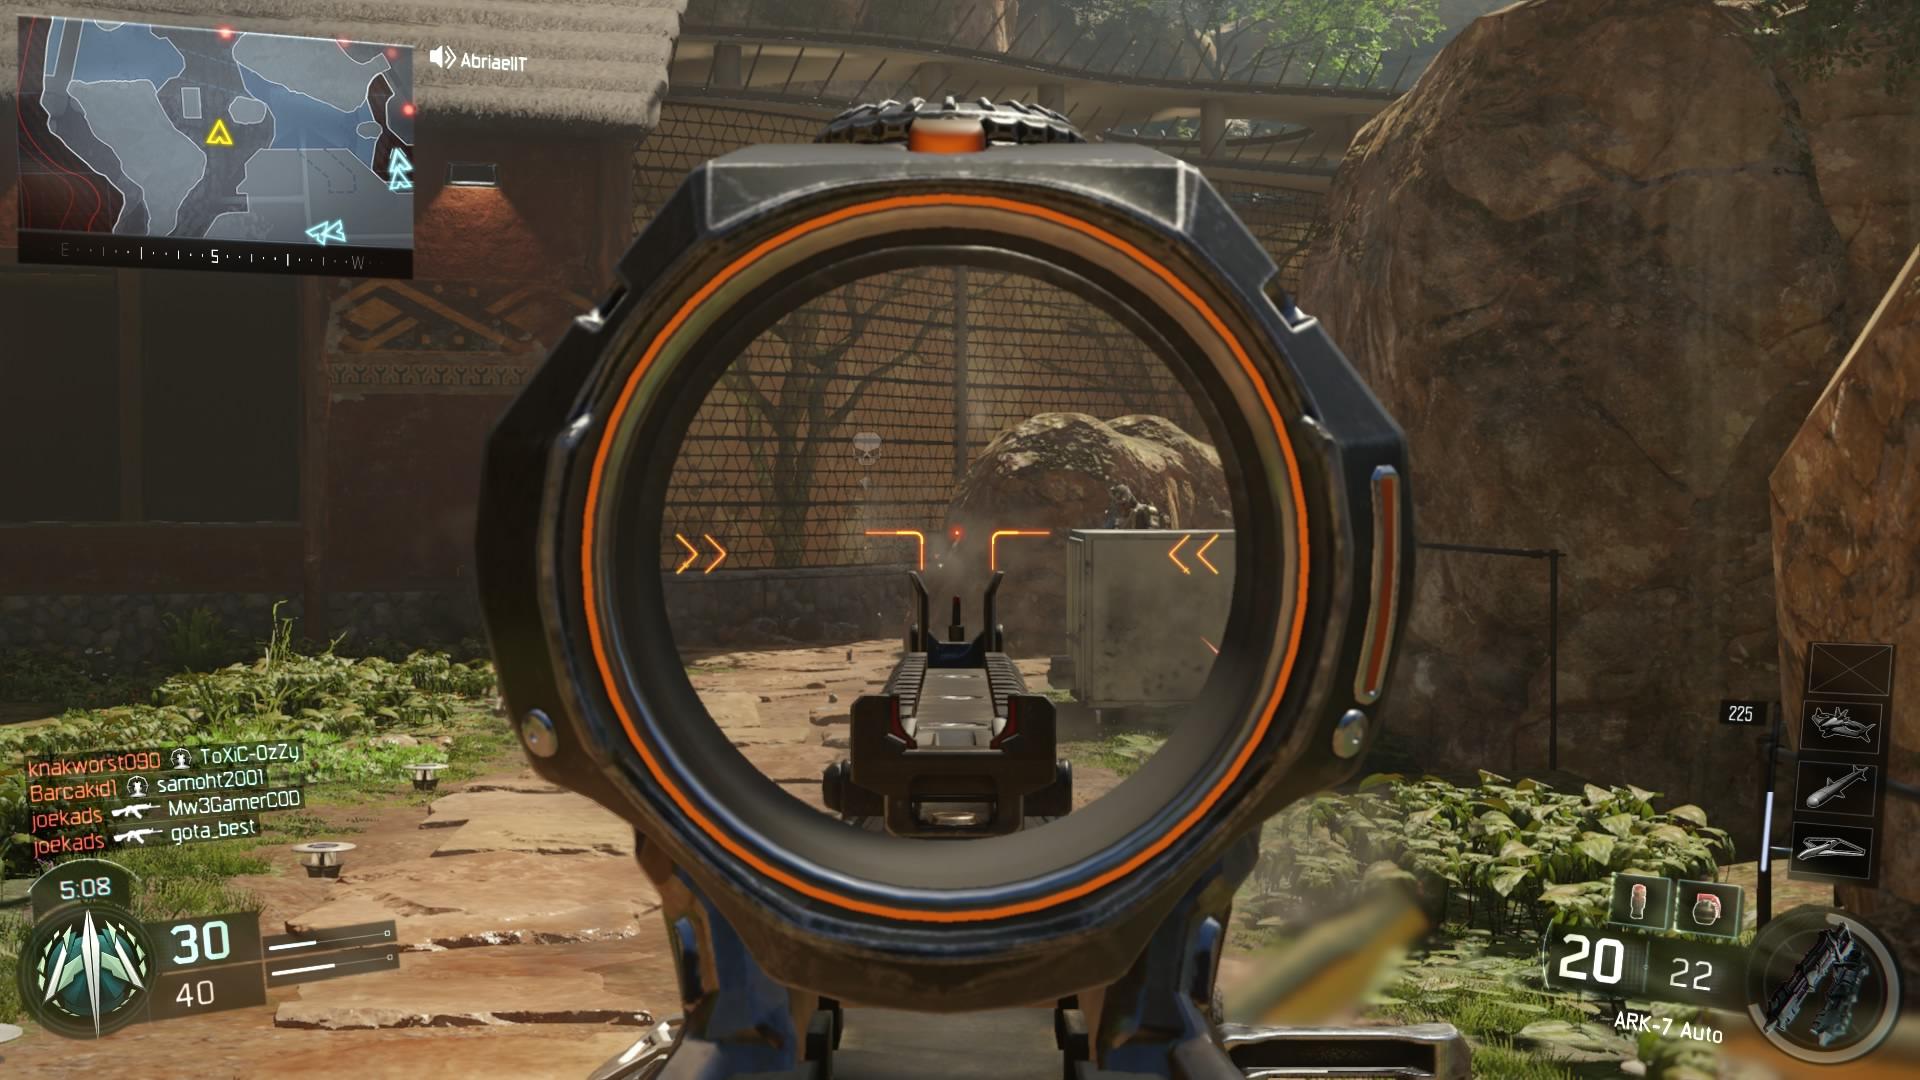 Black Ops 3 Gets Beautiful 1080p Screenshots and 1080p60